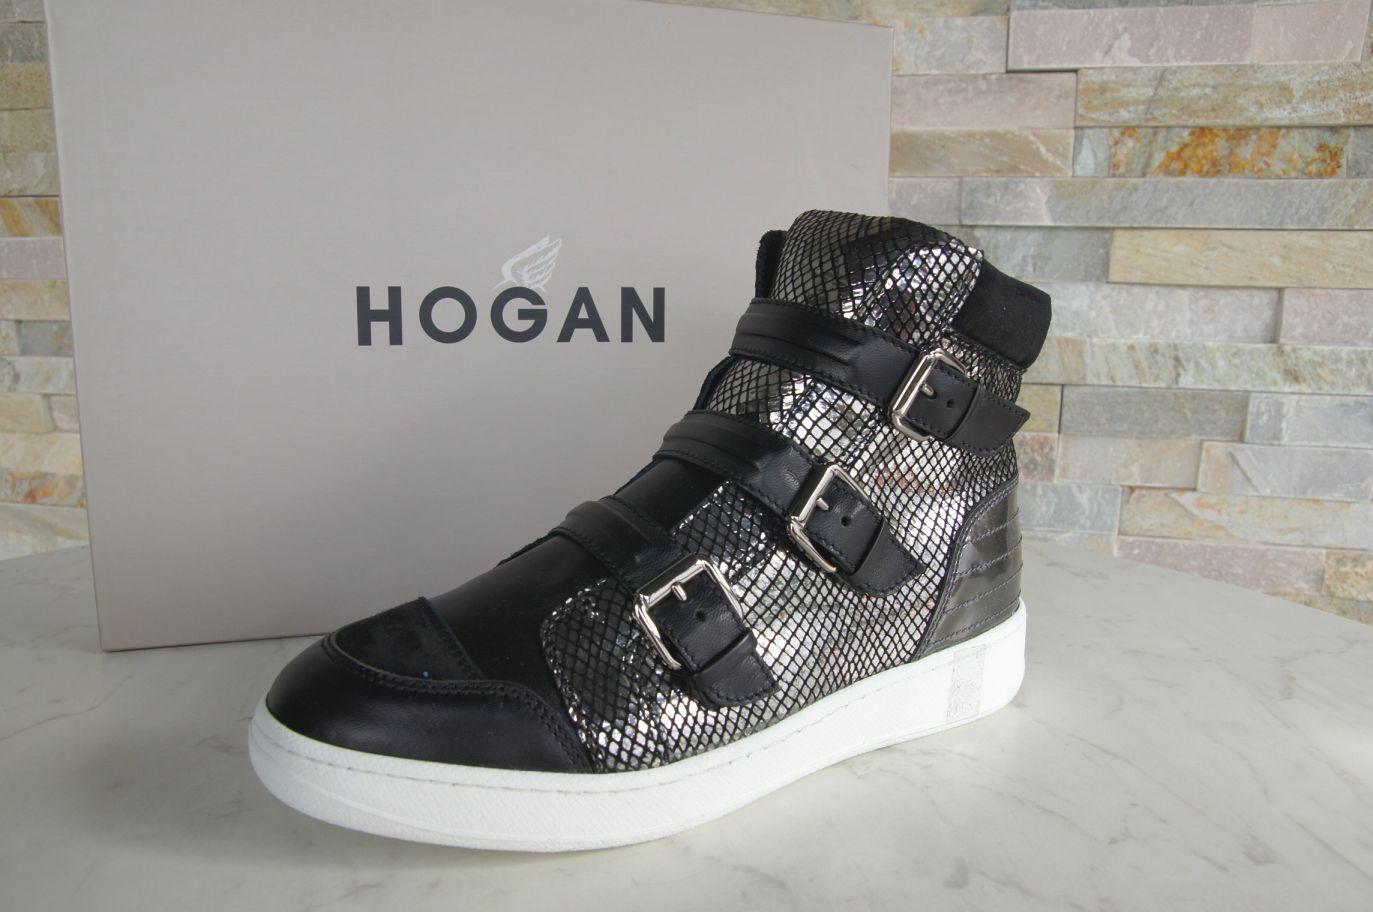 HOGAN taglia 38,5 High-Top High-Top 38,5  Stivaletti   BOOTIES NUOVO ex. UVP 884b58